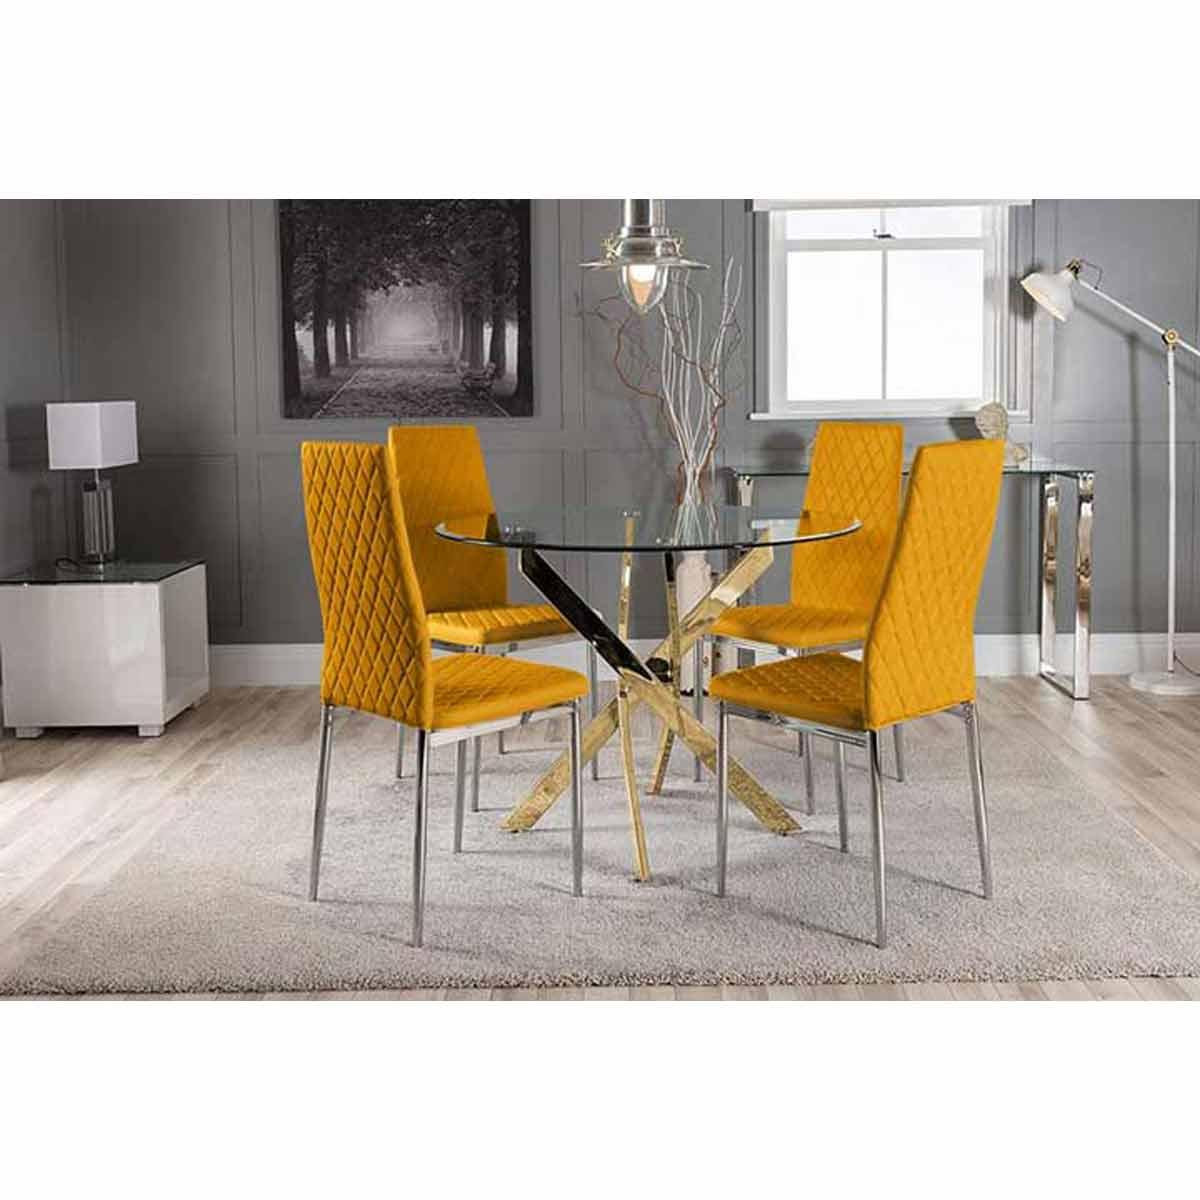 Furniture Box Novara Gold Metal Round Glass Dining Table And 4 Mustard Milan Dining Chairs